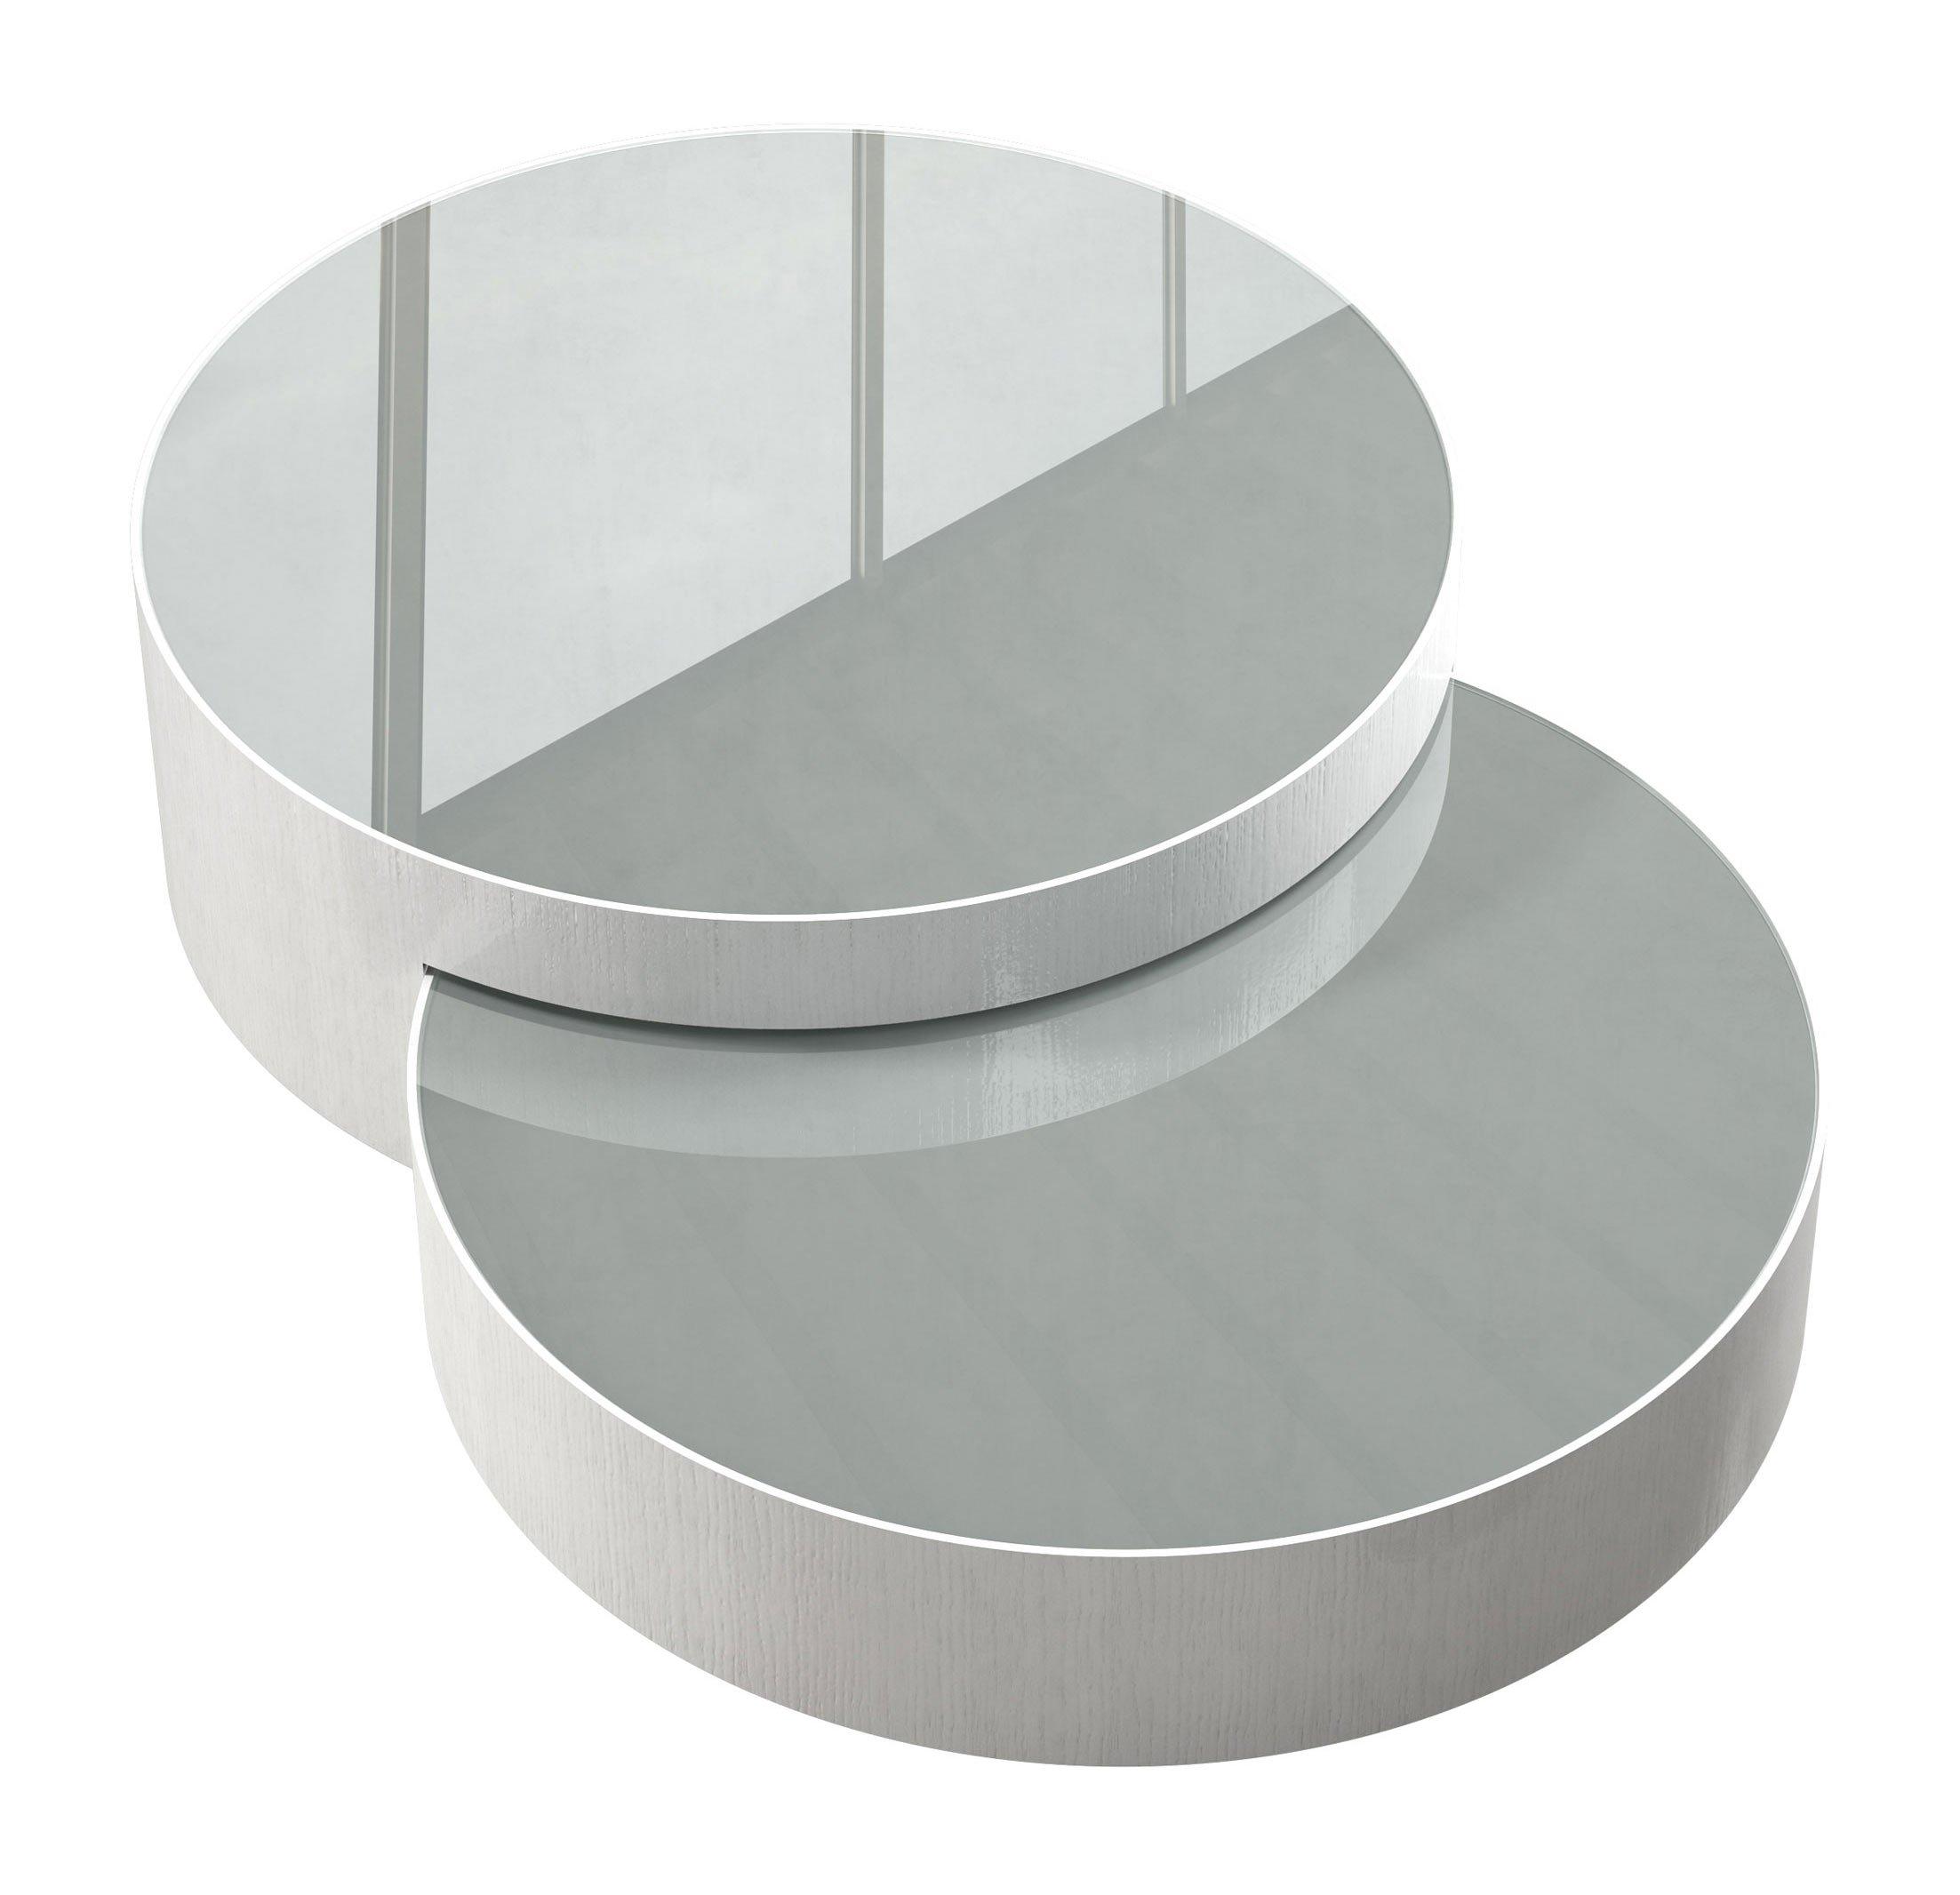 Berkeley Nesting Coffee Table White Glass on White Oak by Modloft